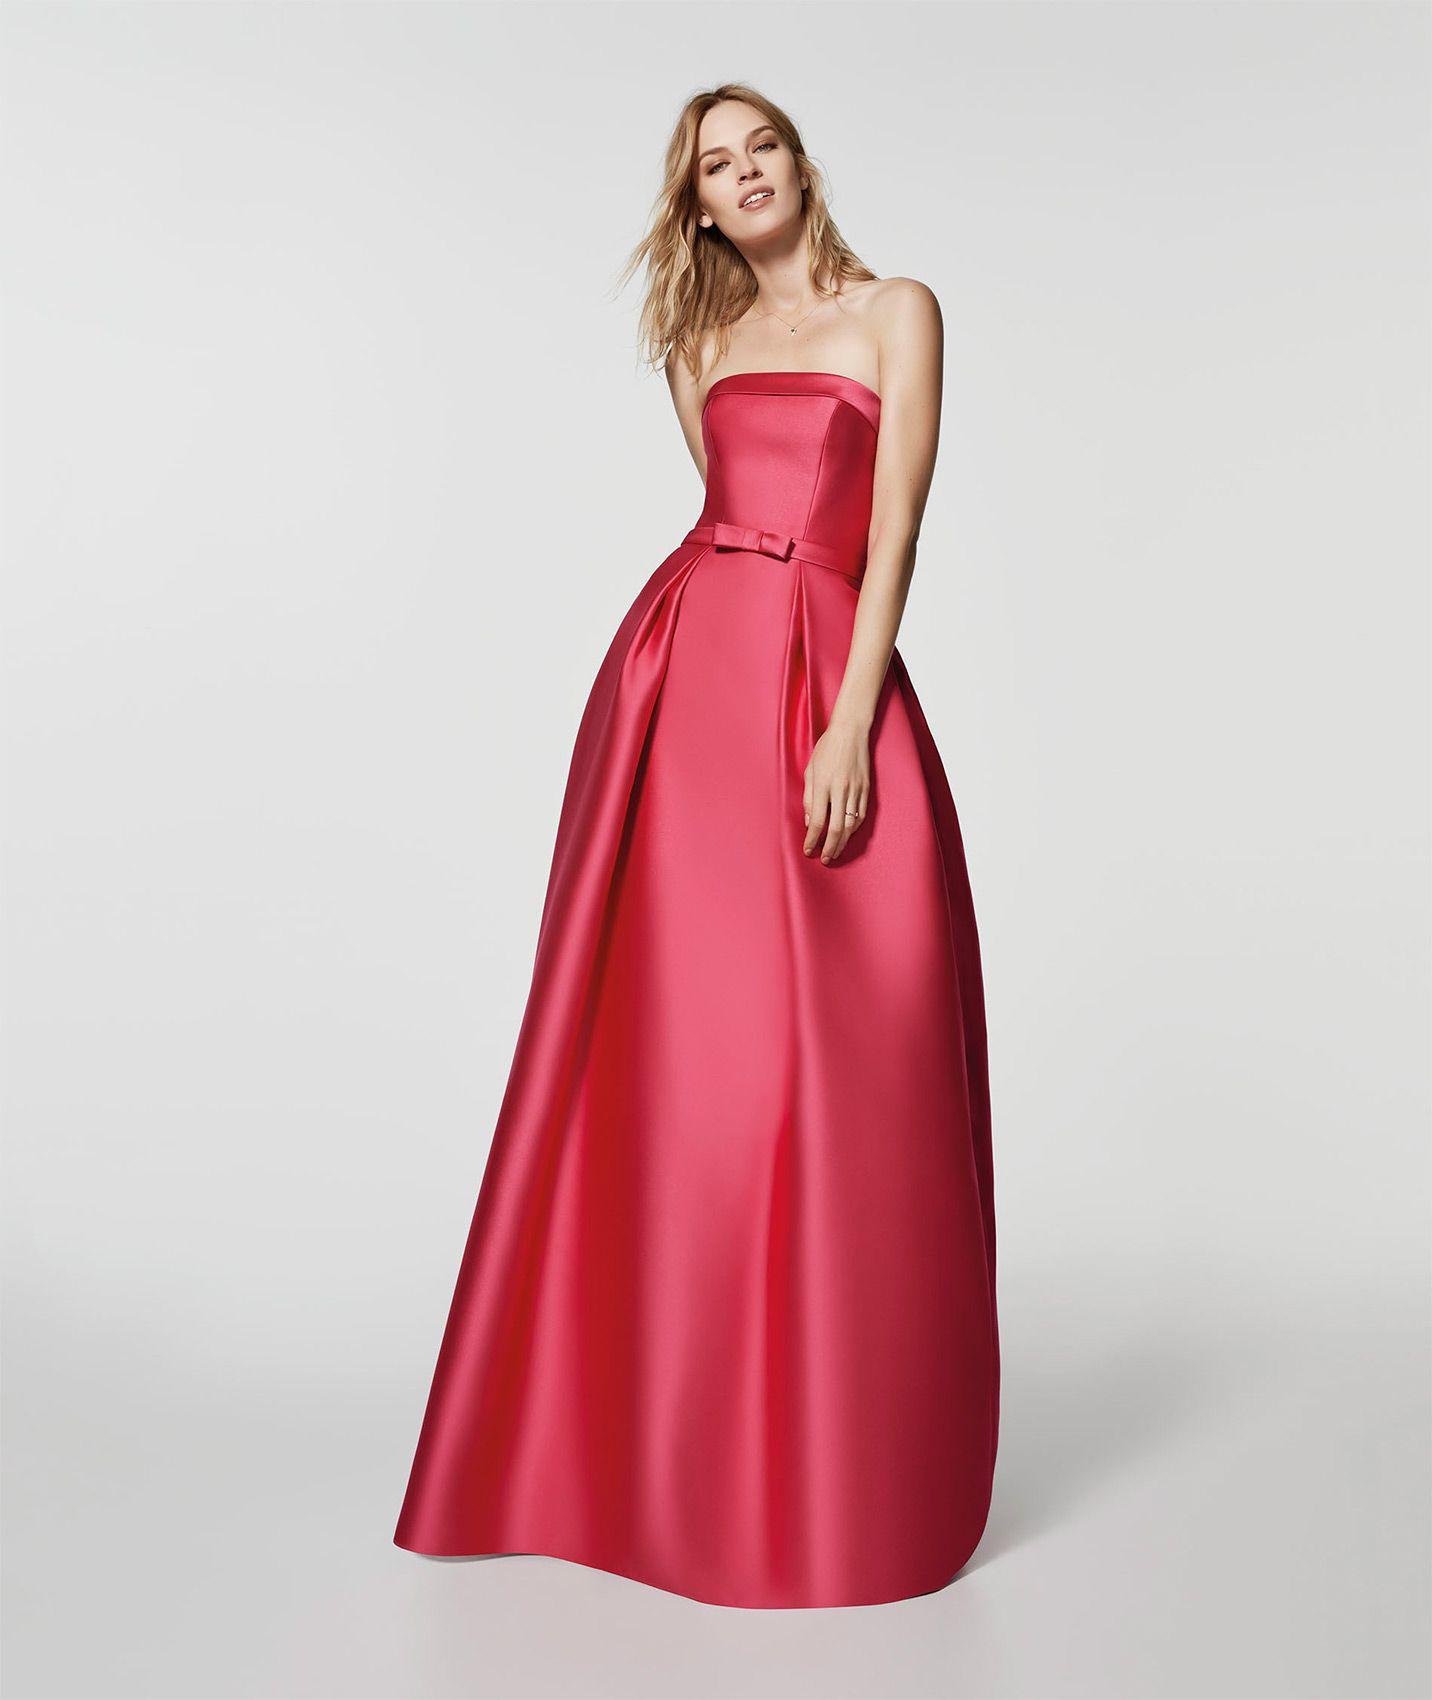 Photo of the pink cocktail dress (62052) GLORIA long sleeveless ...